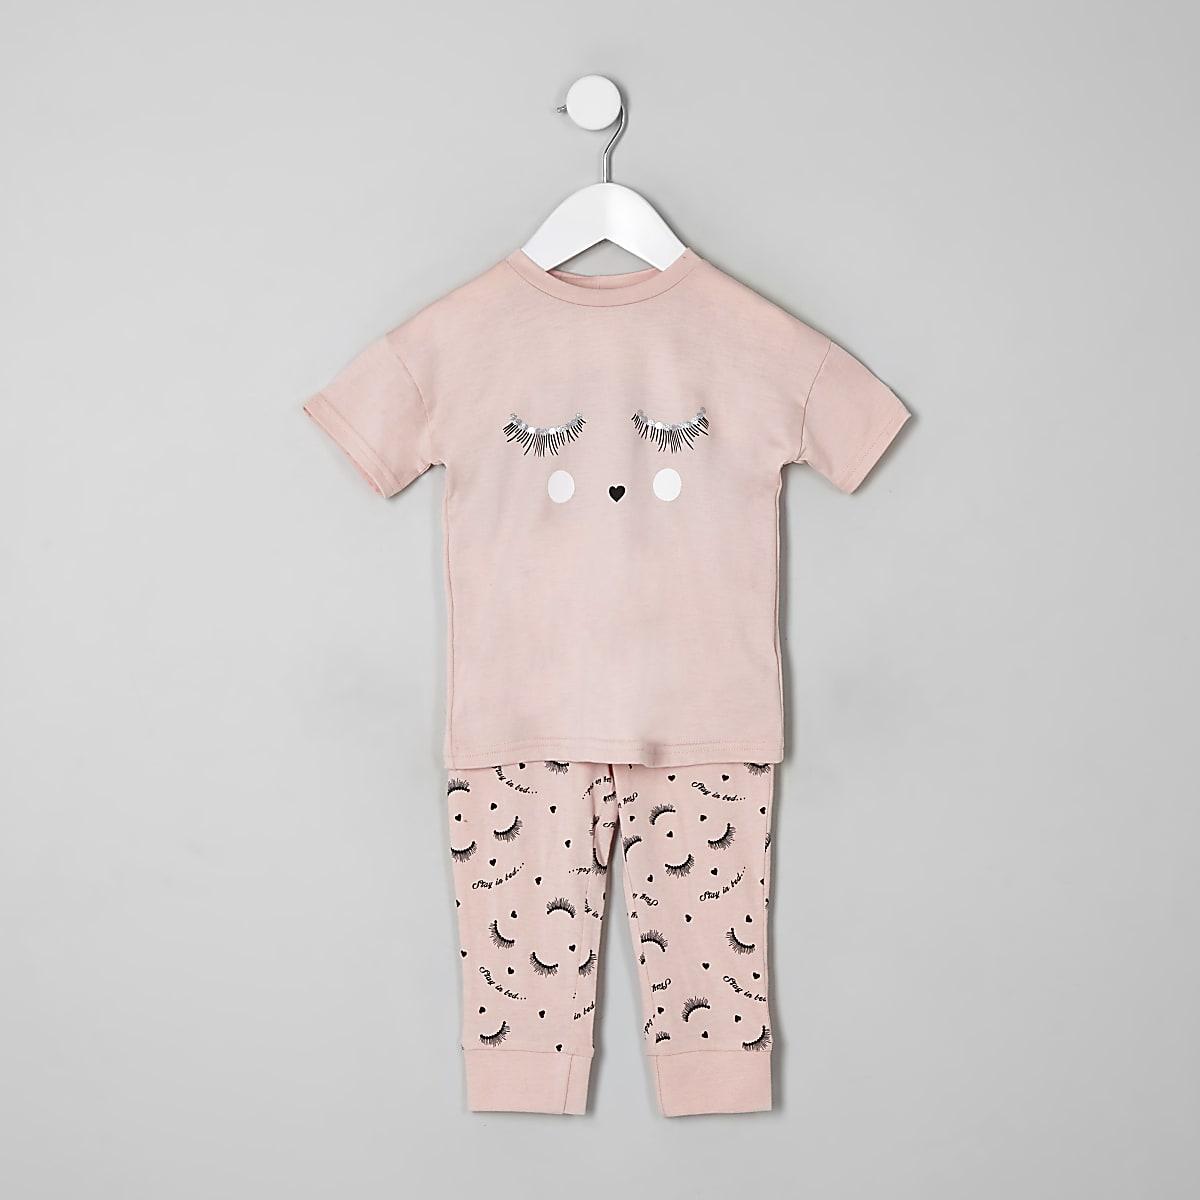 dca996b51e Mini girls pink 'eyelash' pyjama set - Baby Girls Pyjamas ...